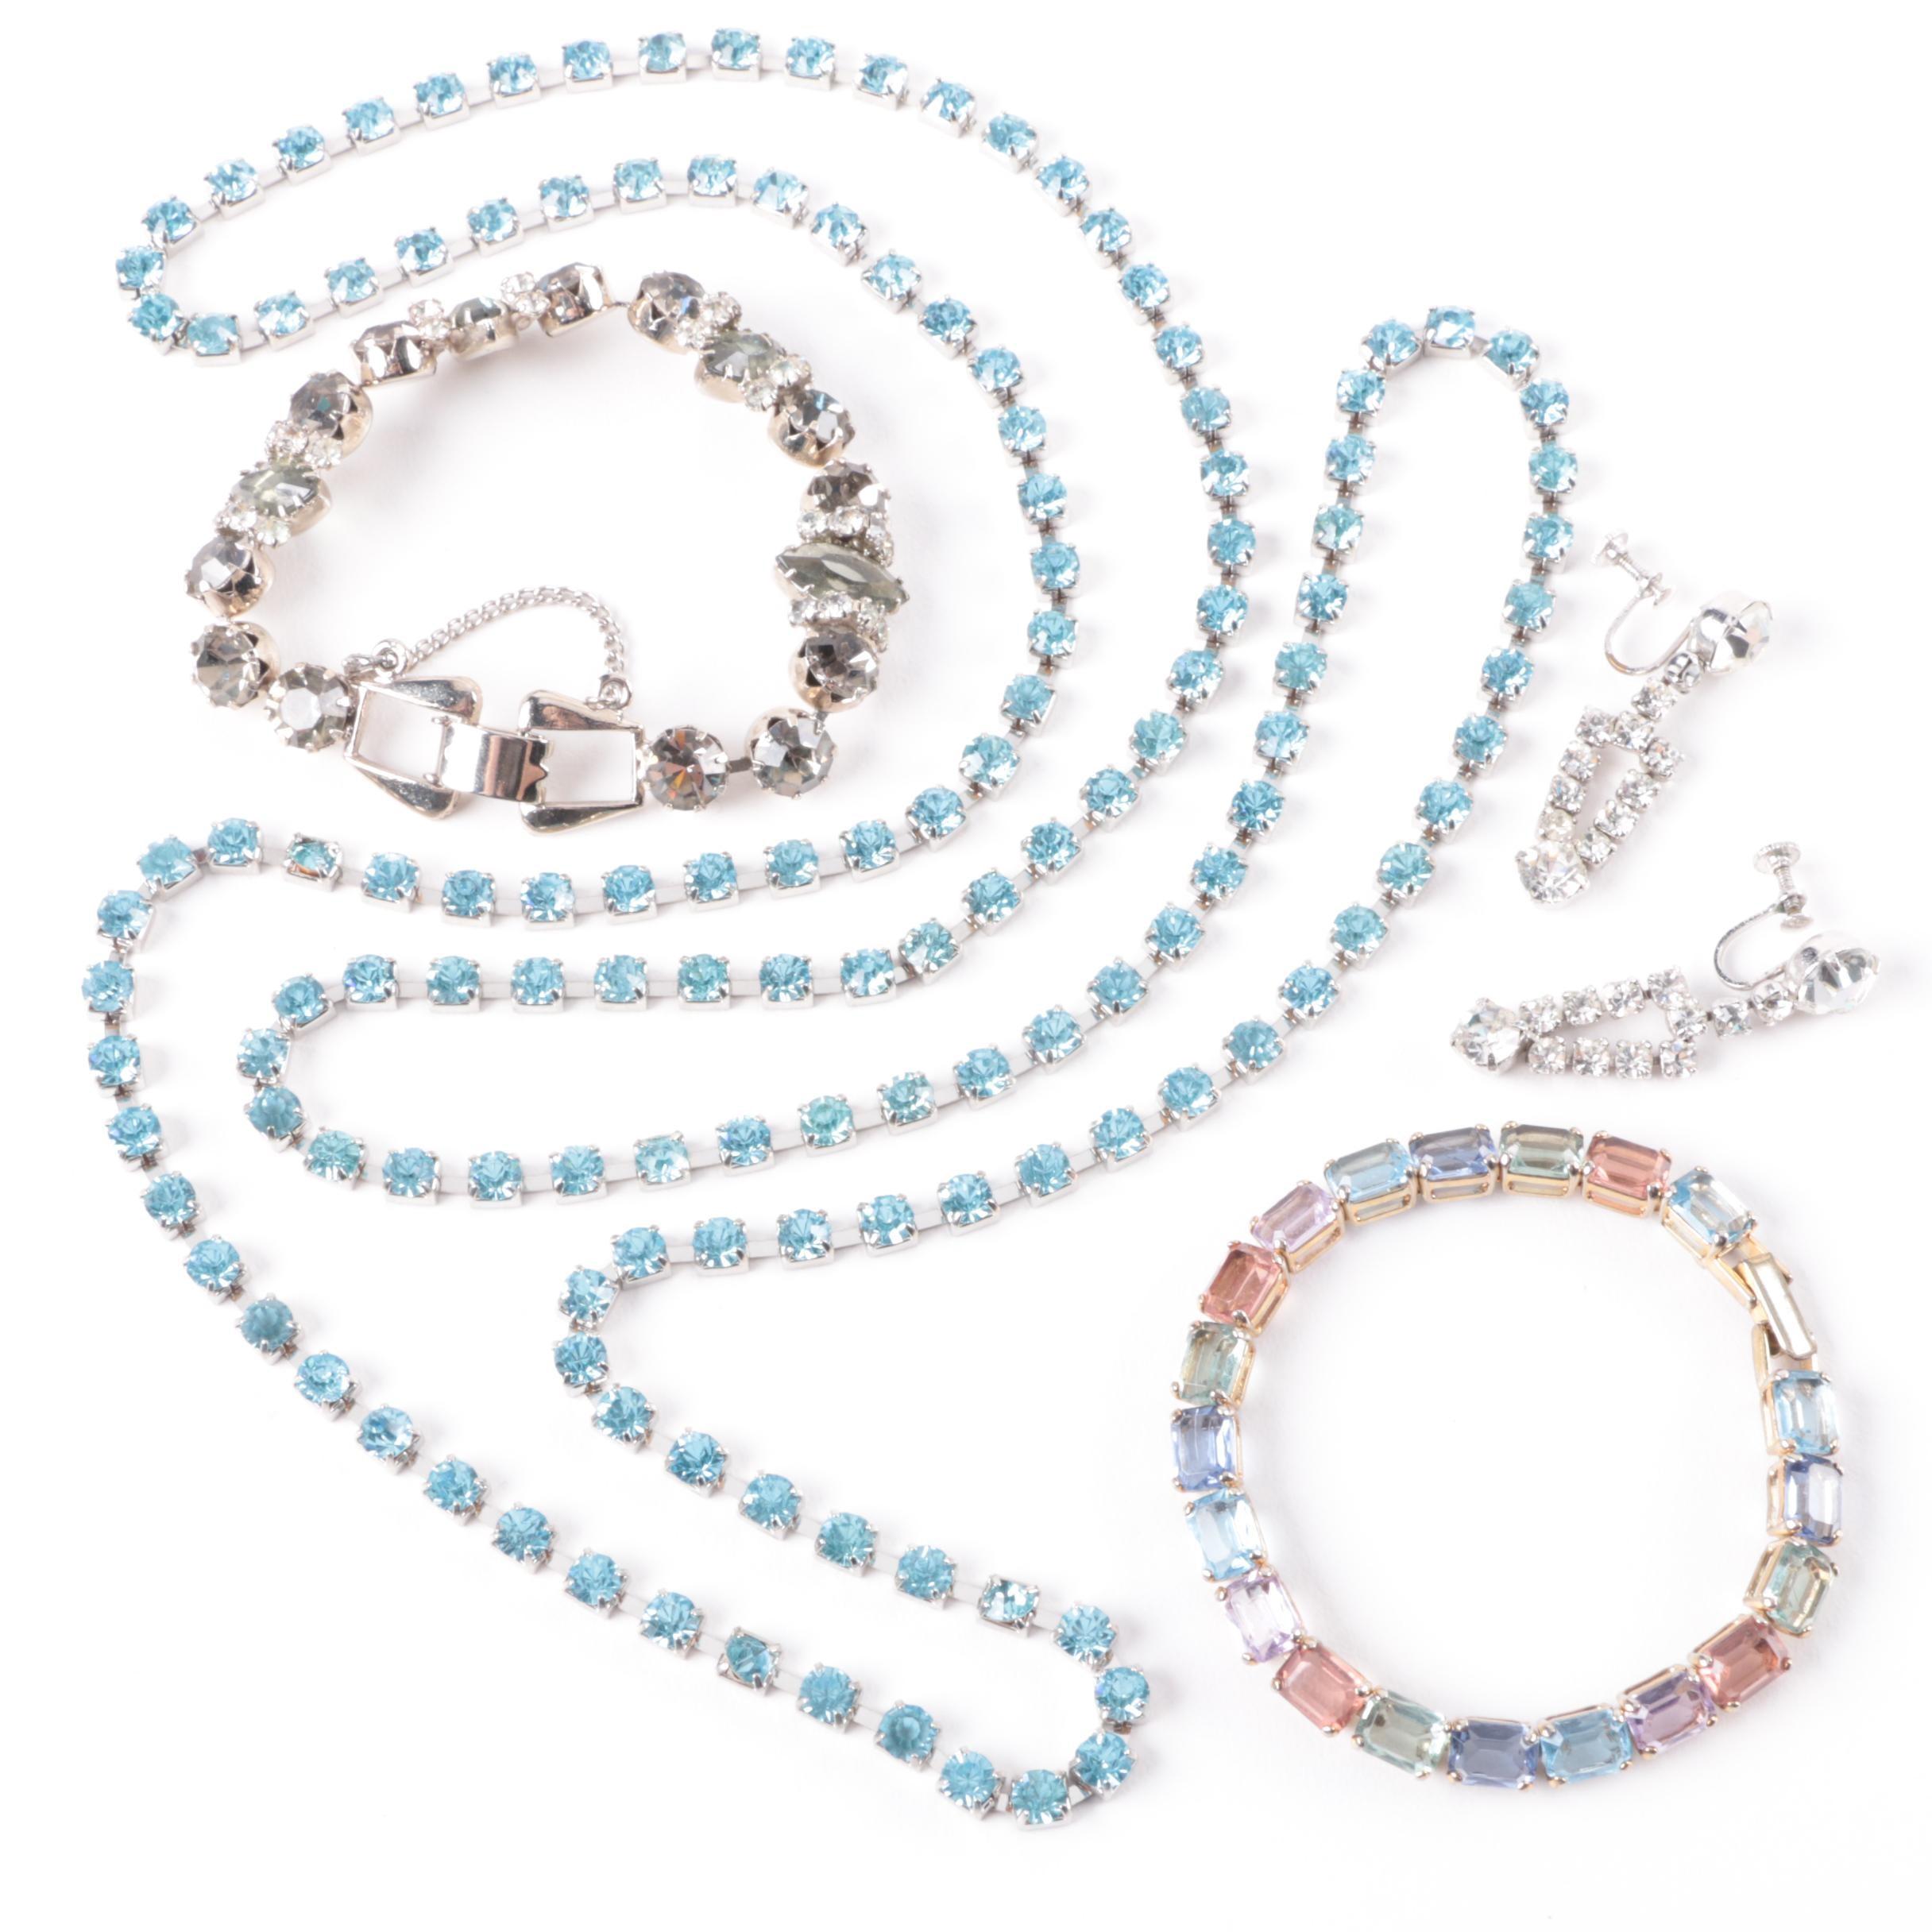 Silver Tone Jewelry Including Rhinestones